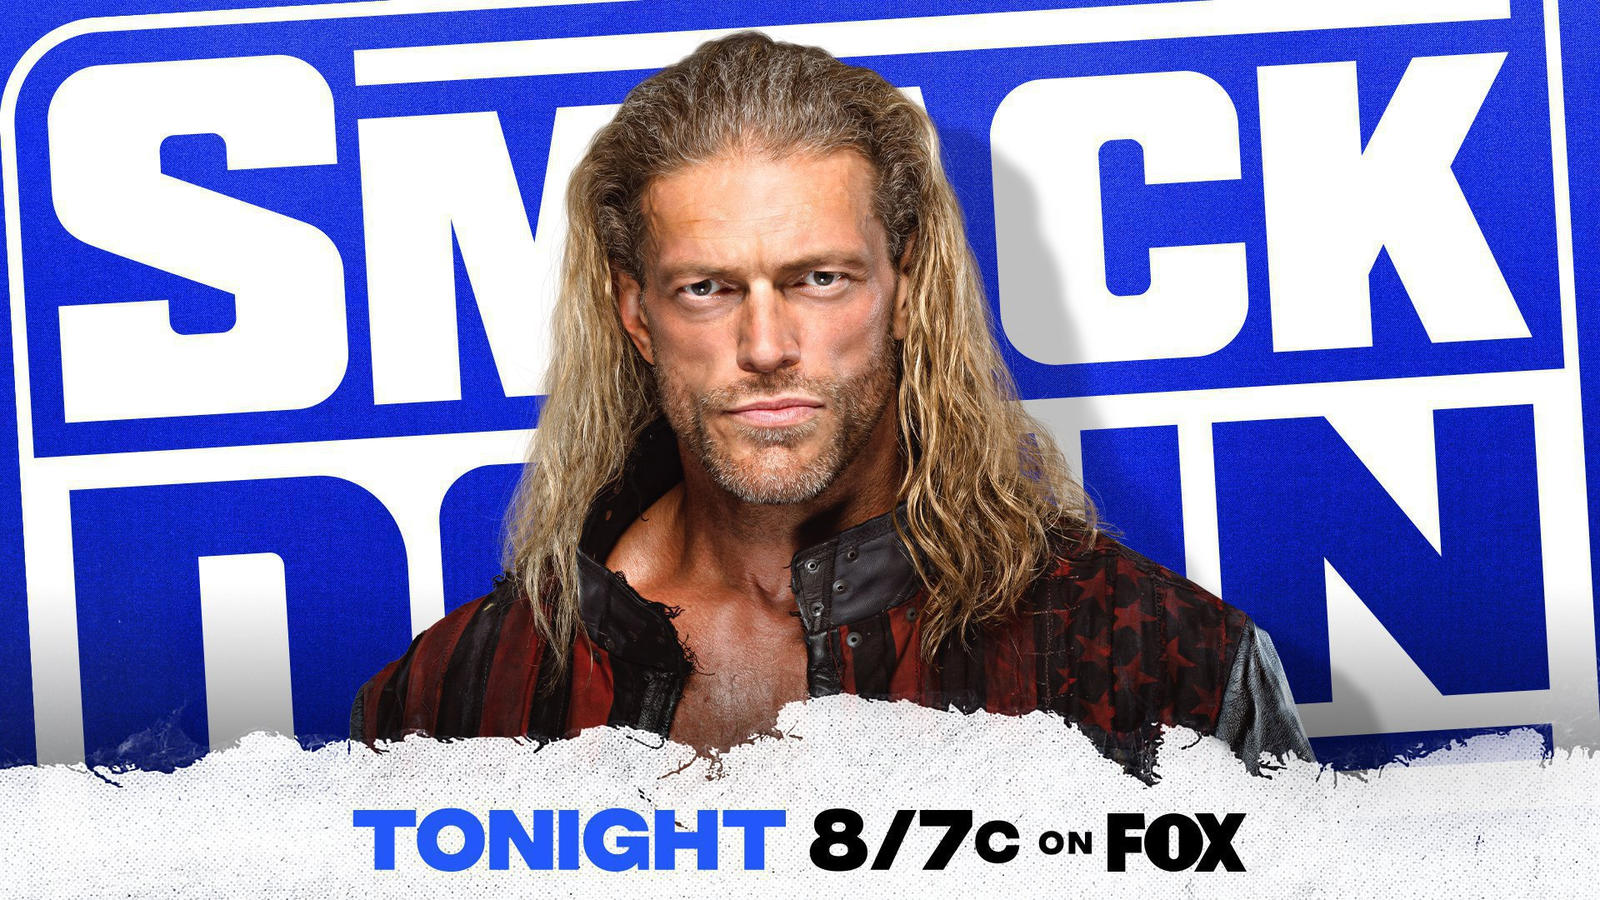 Edge To Address Roman Reigns On Tonight's Smackdown